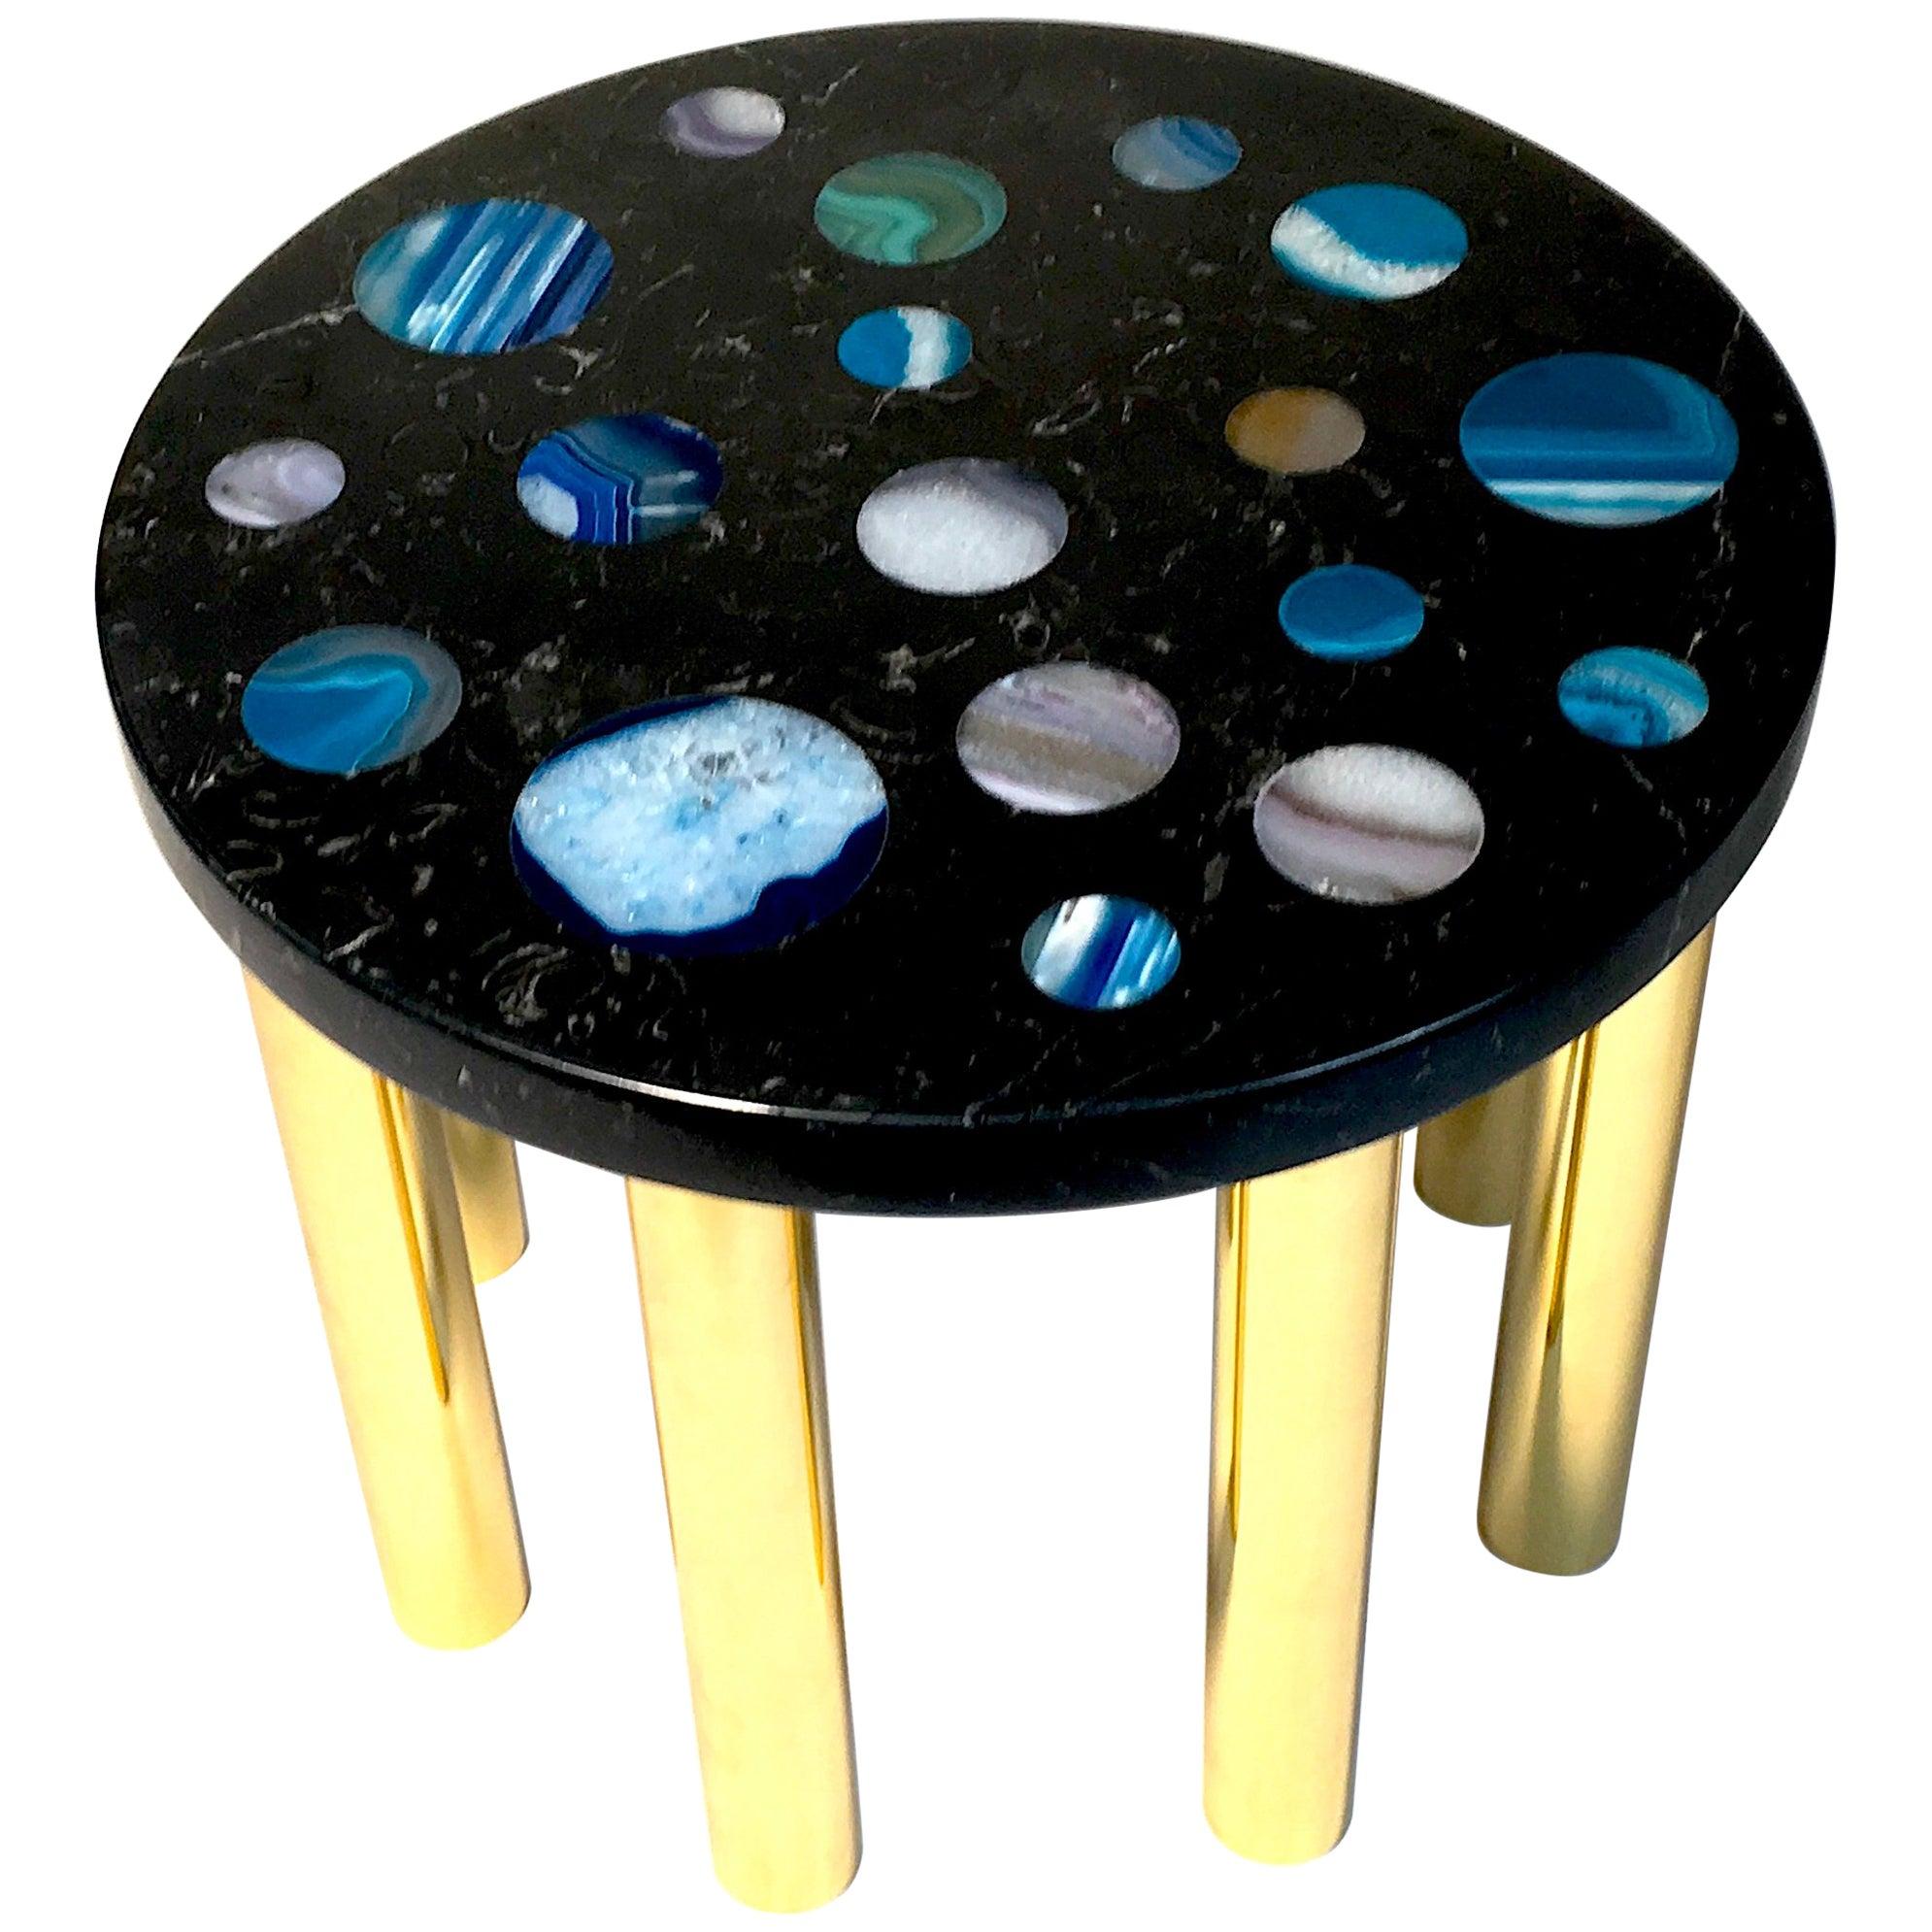 Cosmos Coffee Table by Studio Superego, Italy